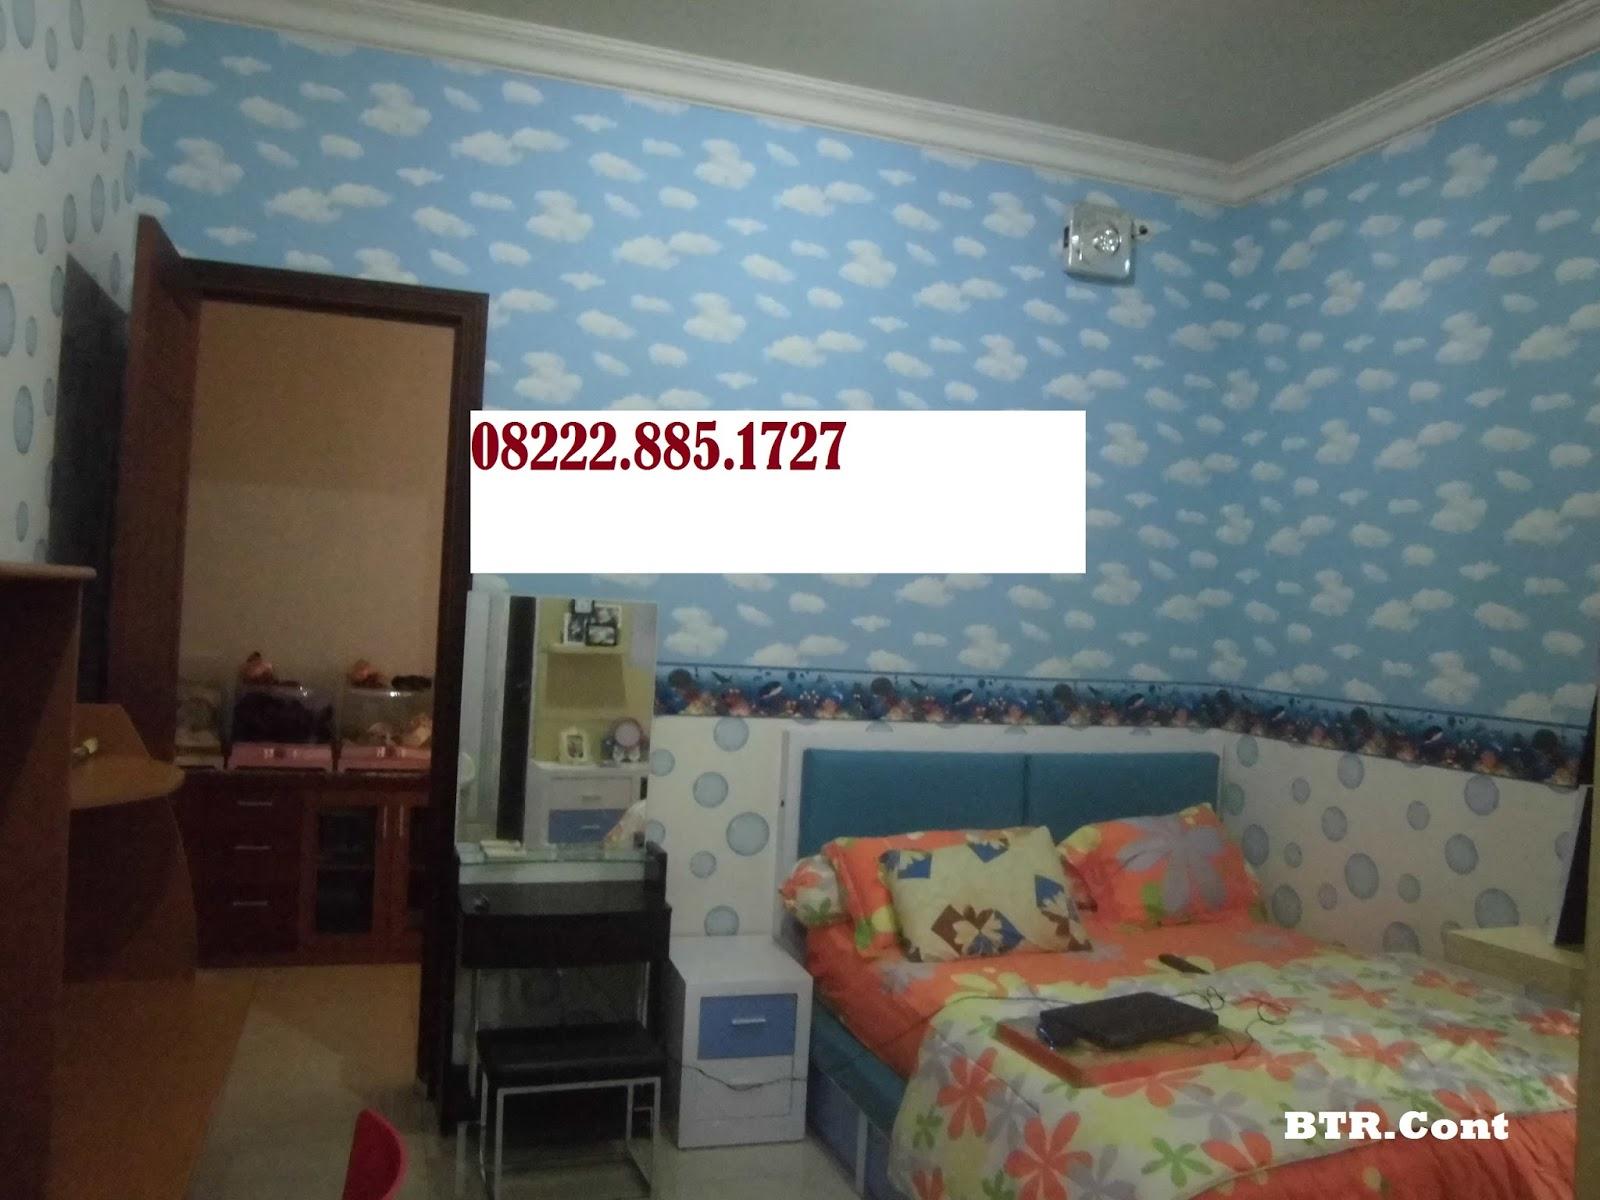 jasainteriorbali@gmail.com: 08222 885 1727 (Tsel) Kitchen Set ...